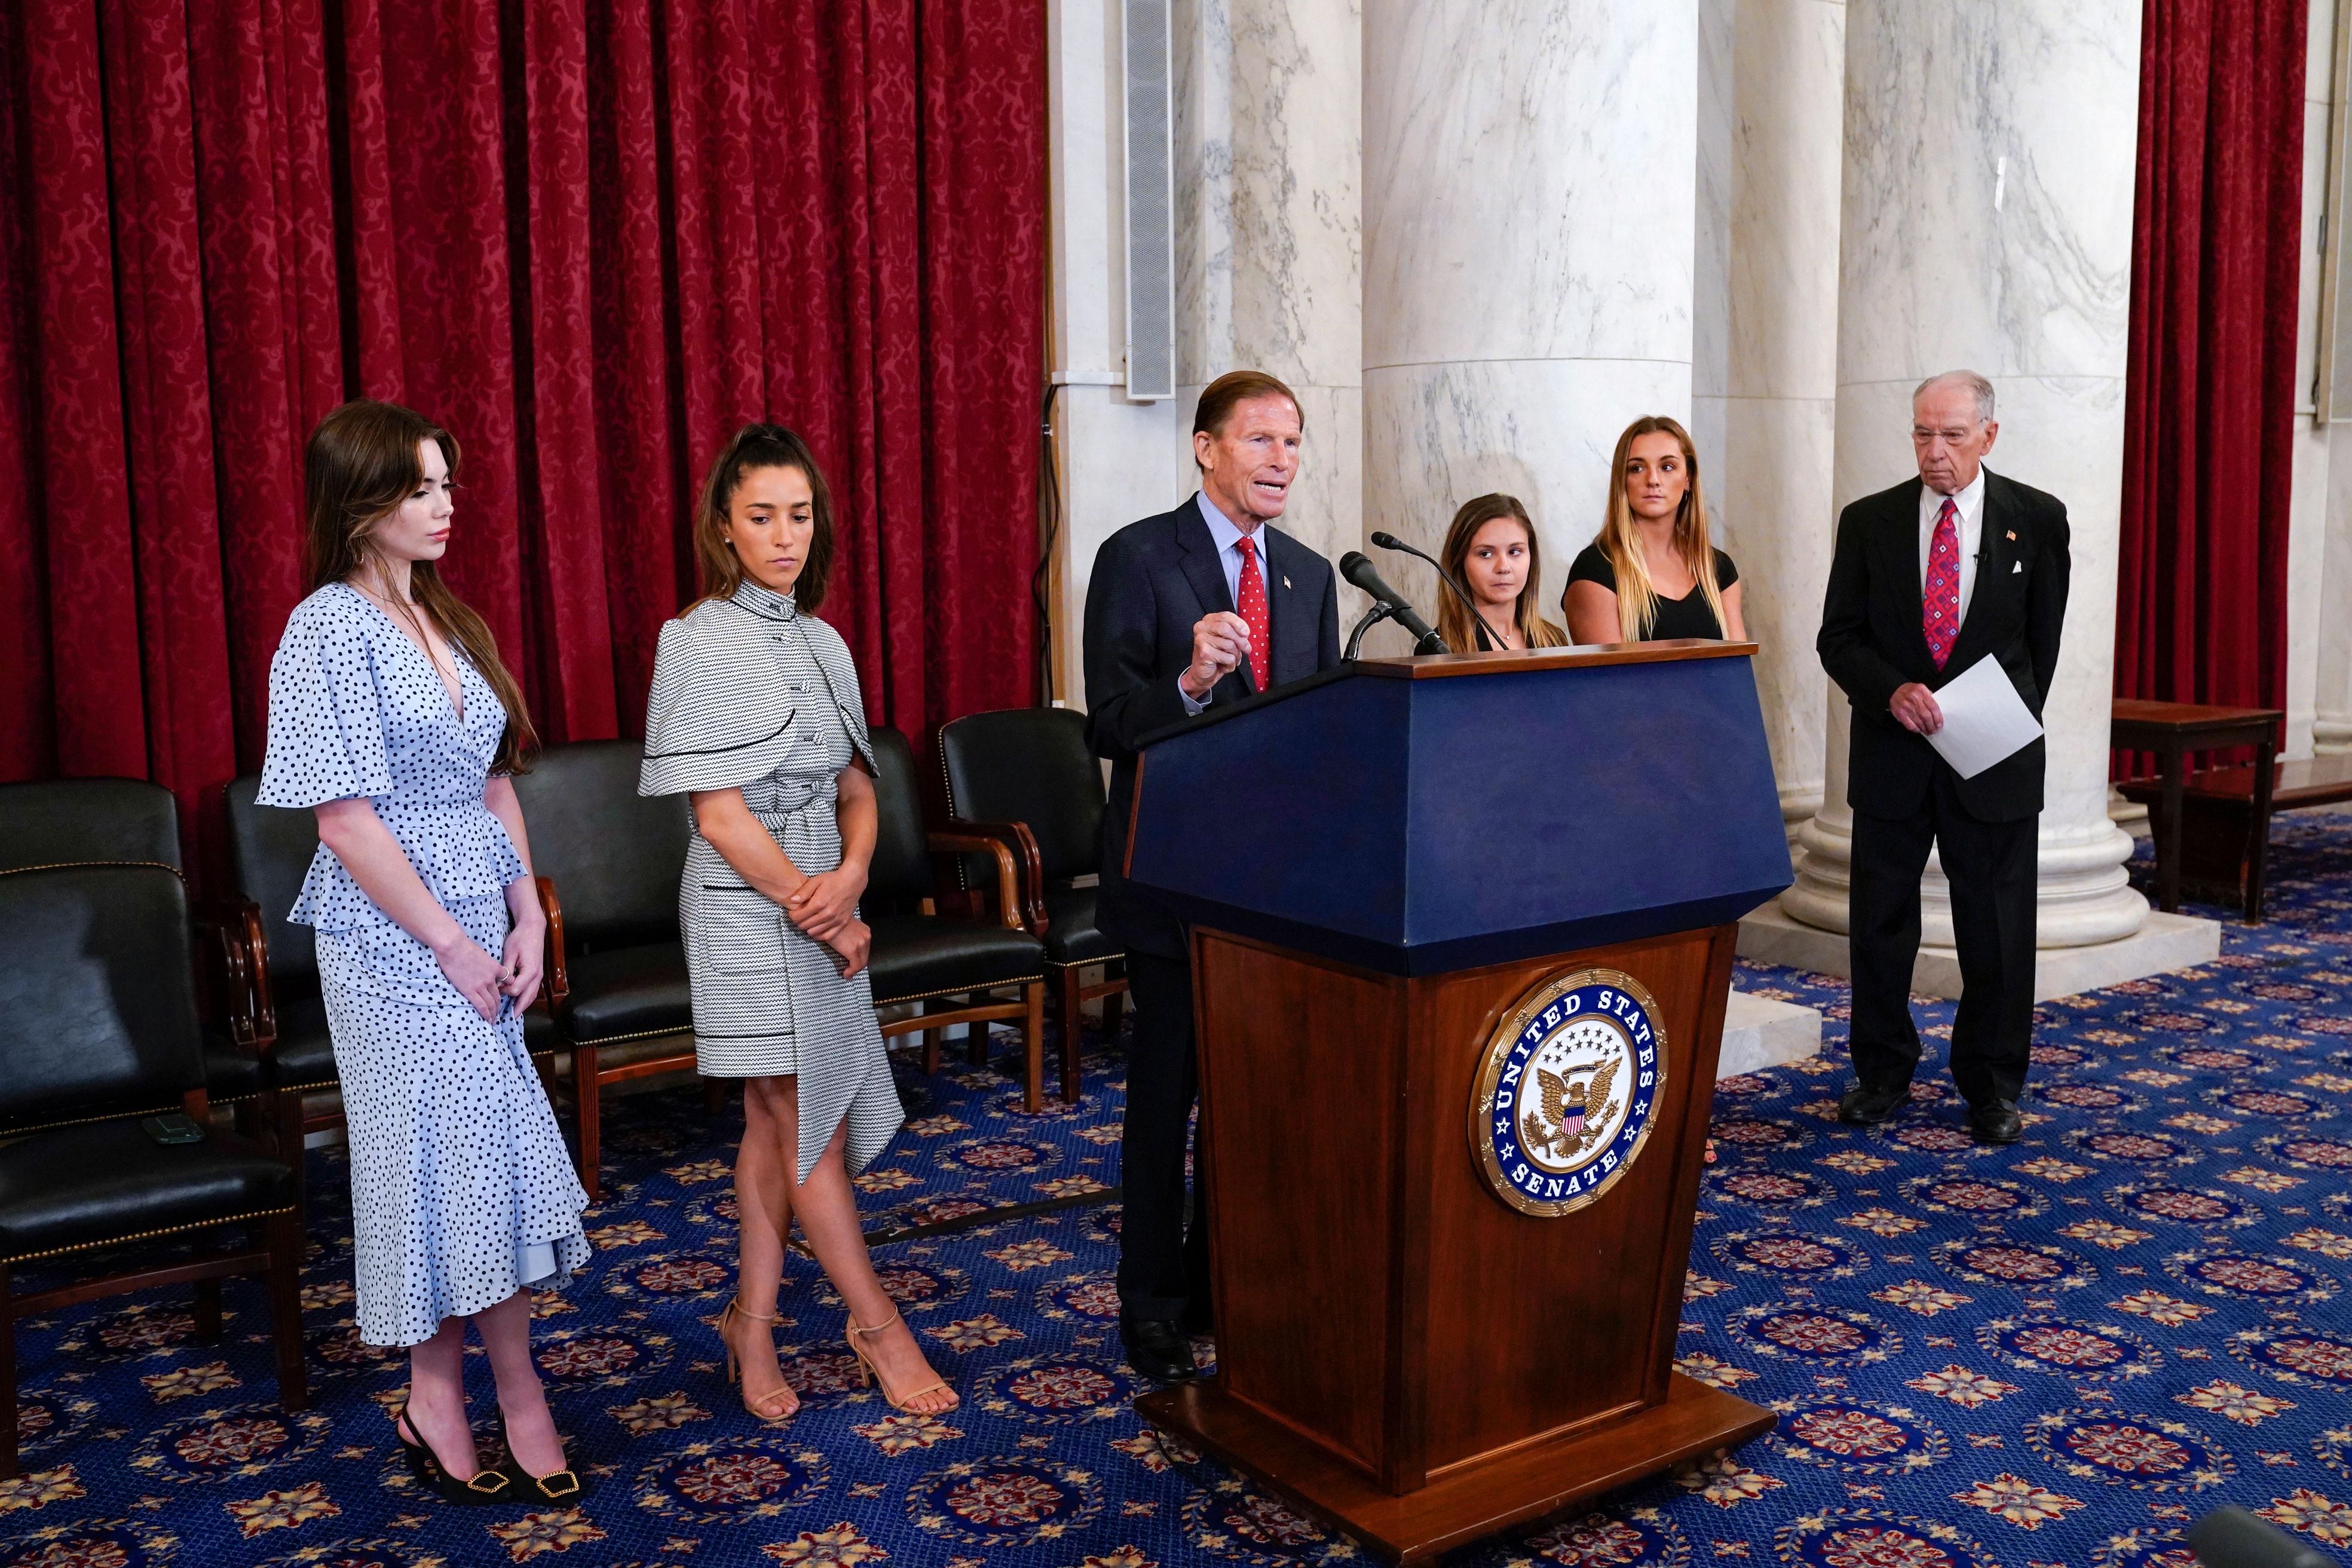 Sen. Richard Blumenthal, center, speaks at a news conference in Washington, DC, on September 15.